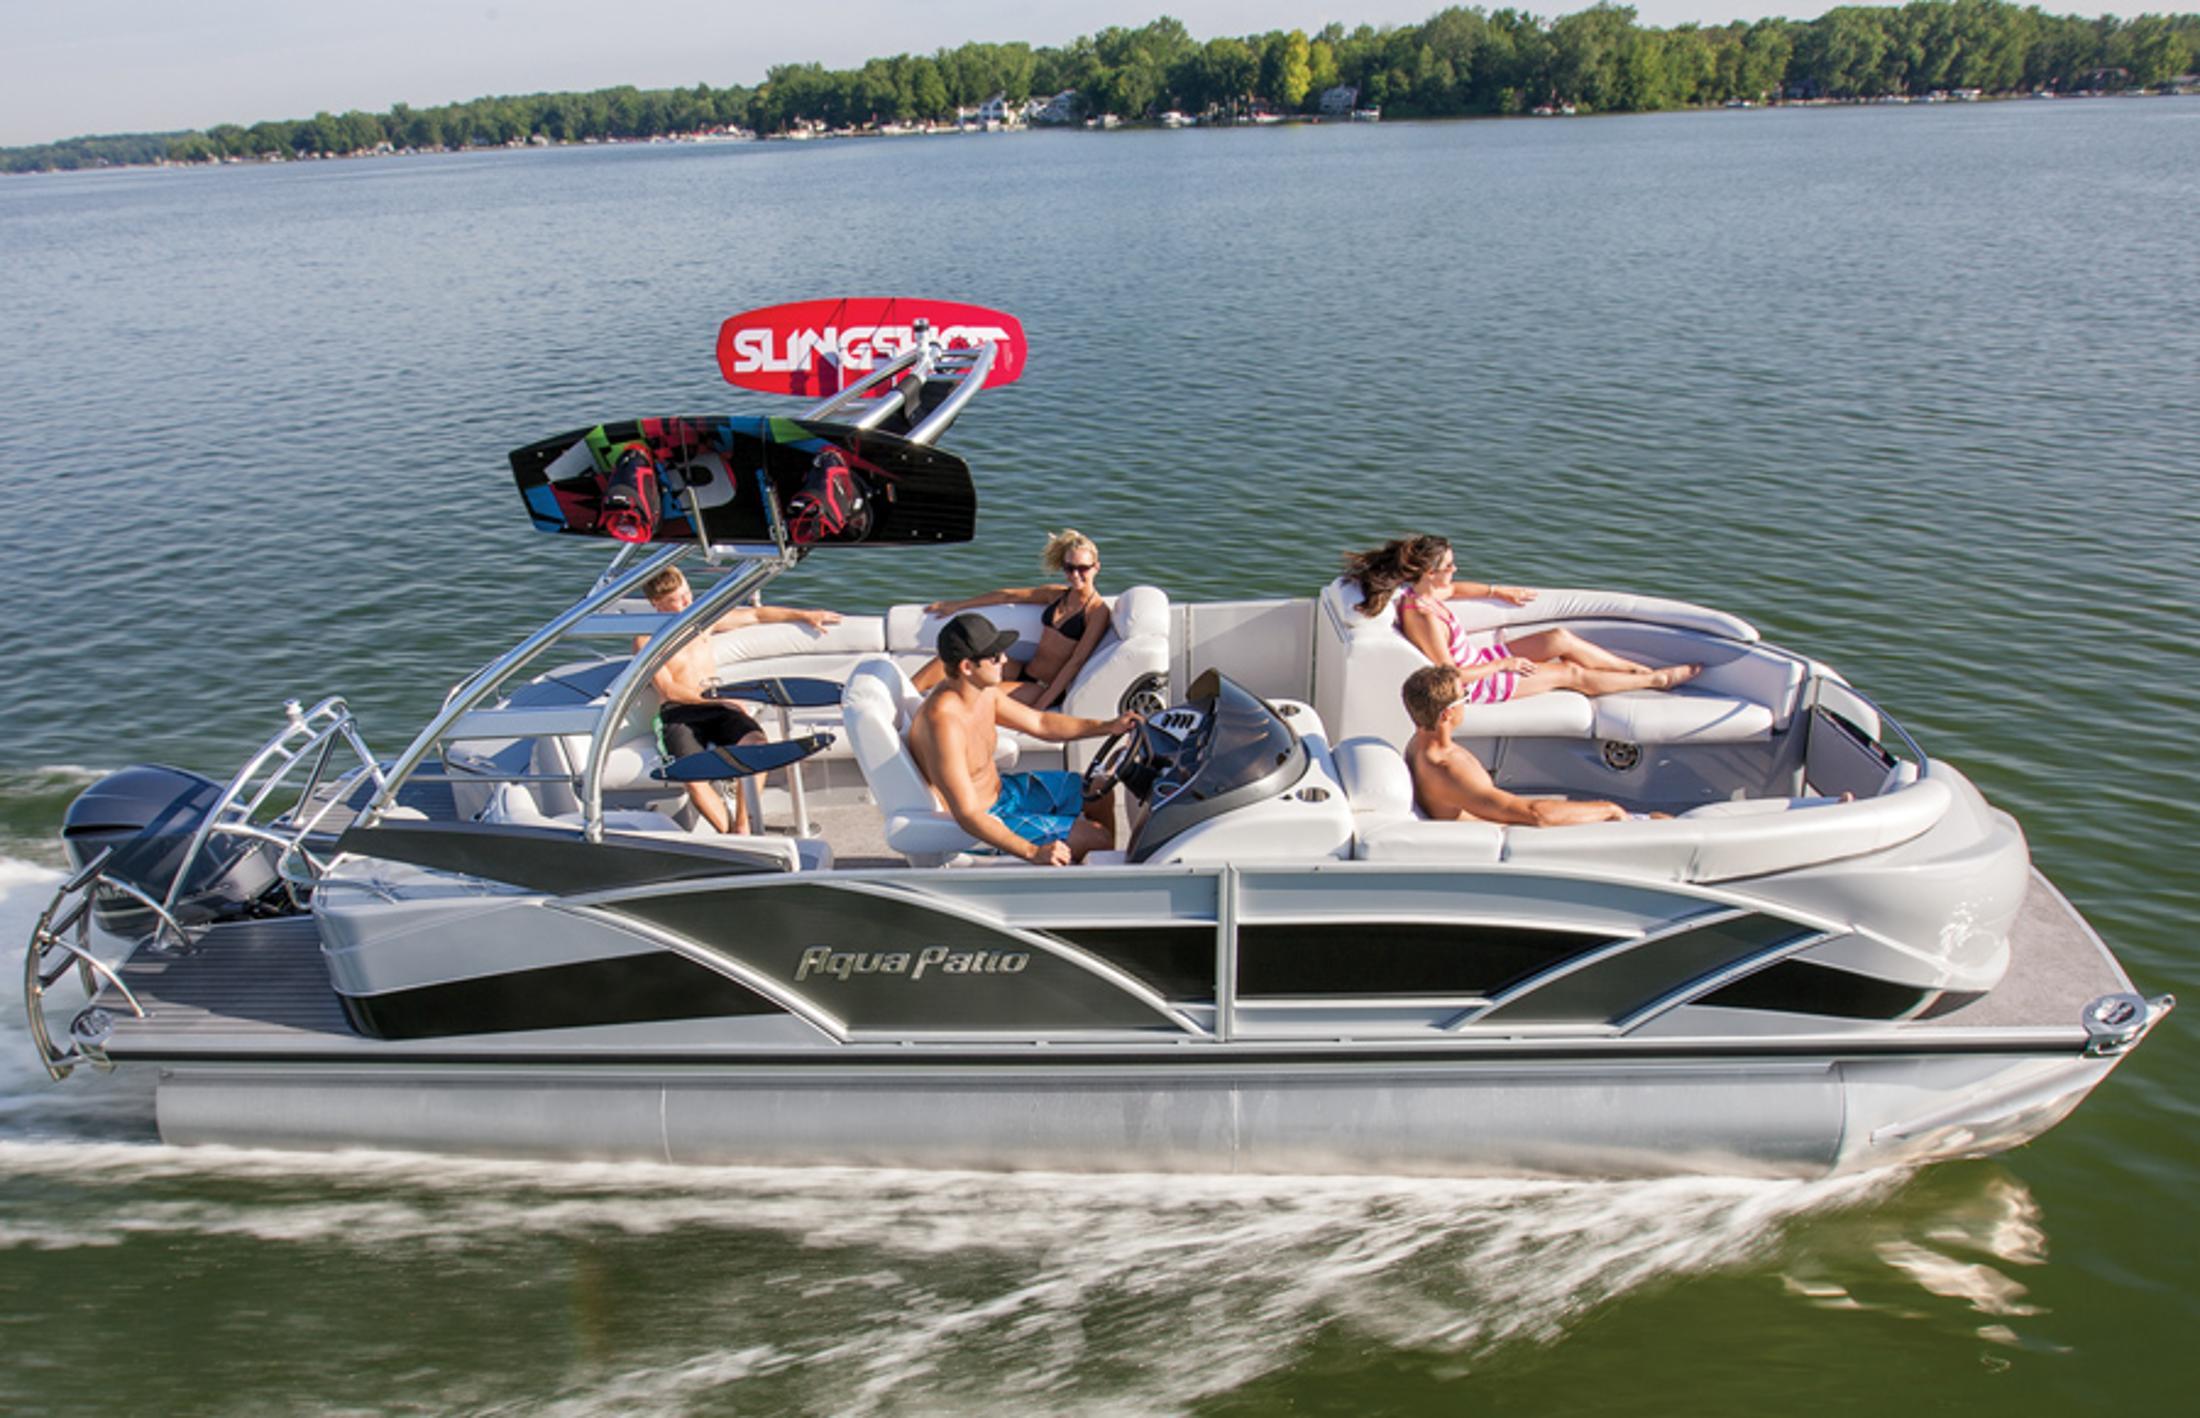 New 2013 Aqua Patio 250 Express Power Boats Inboard in Kalamazoo